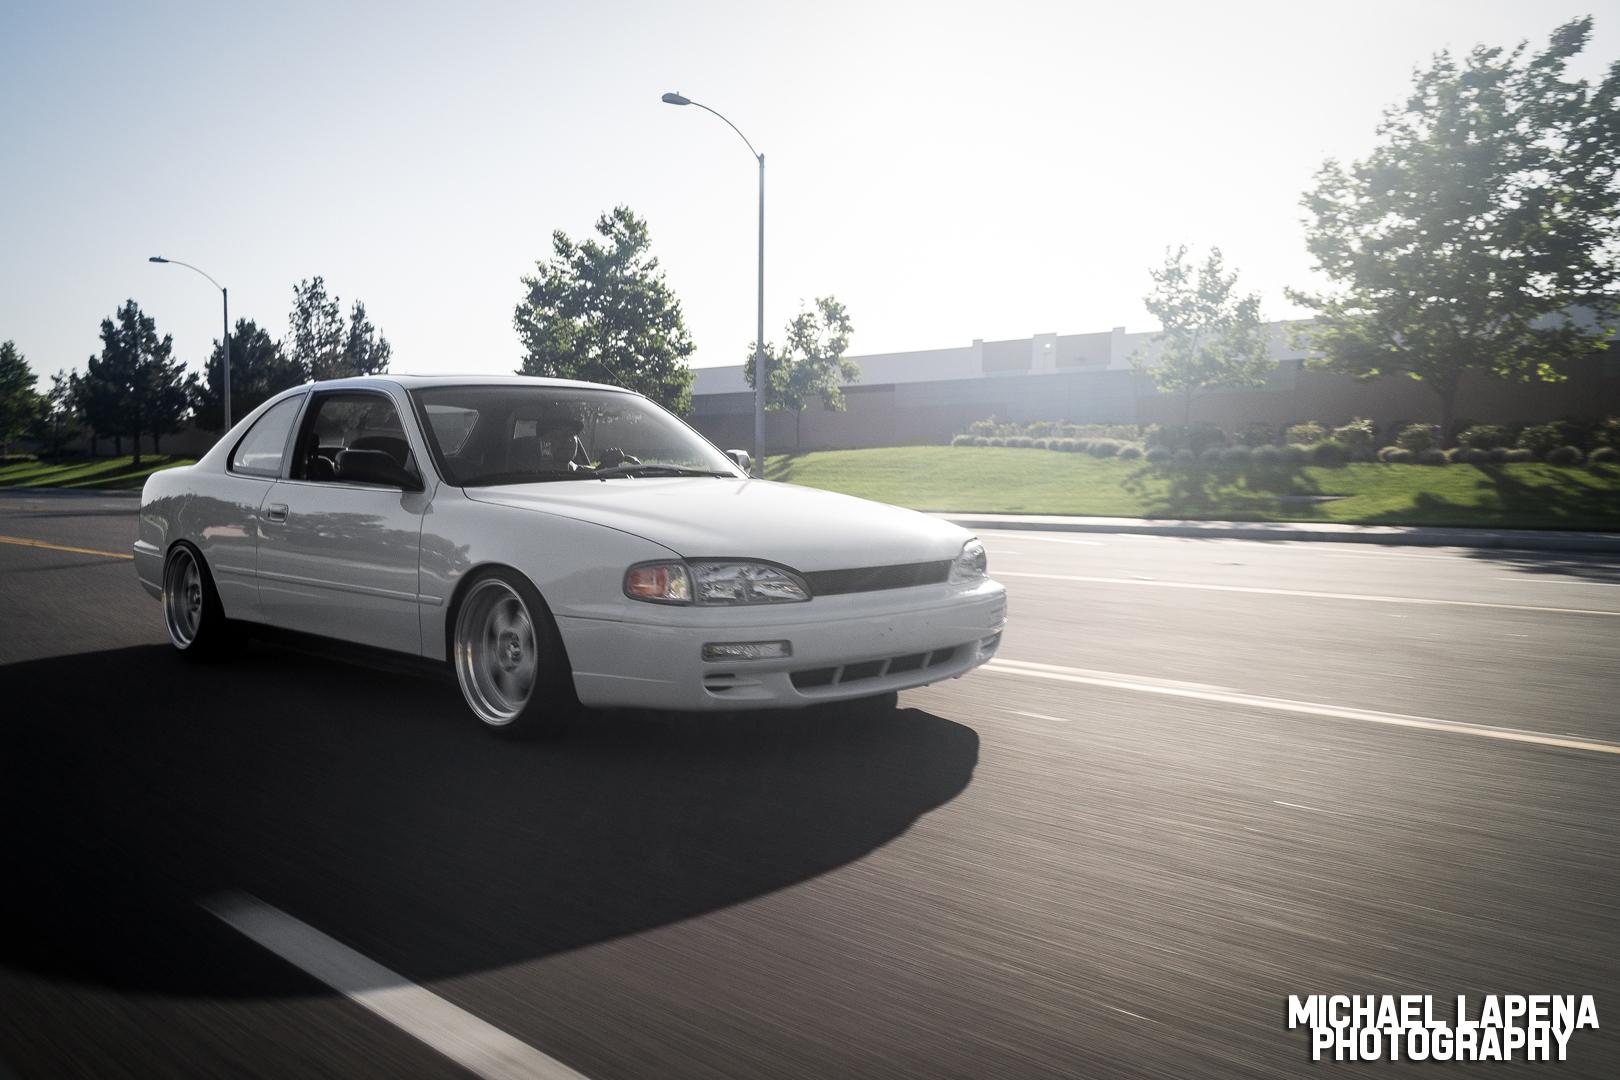 Edwin's Toyota Camry